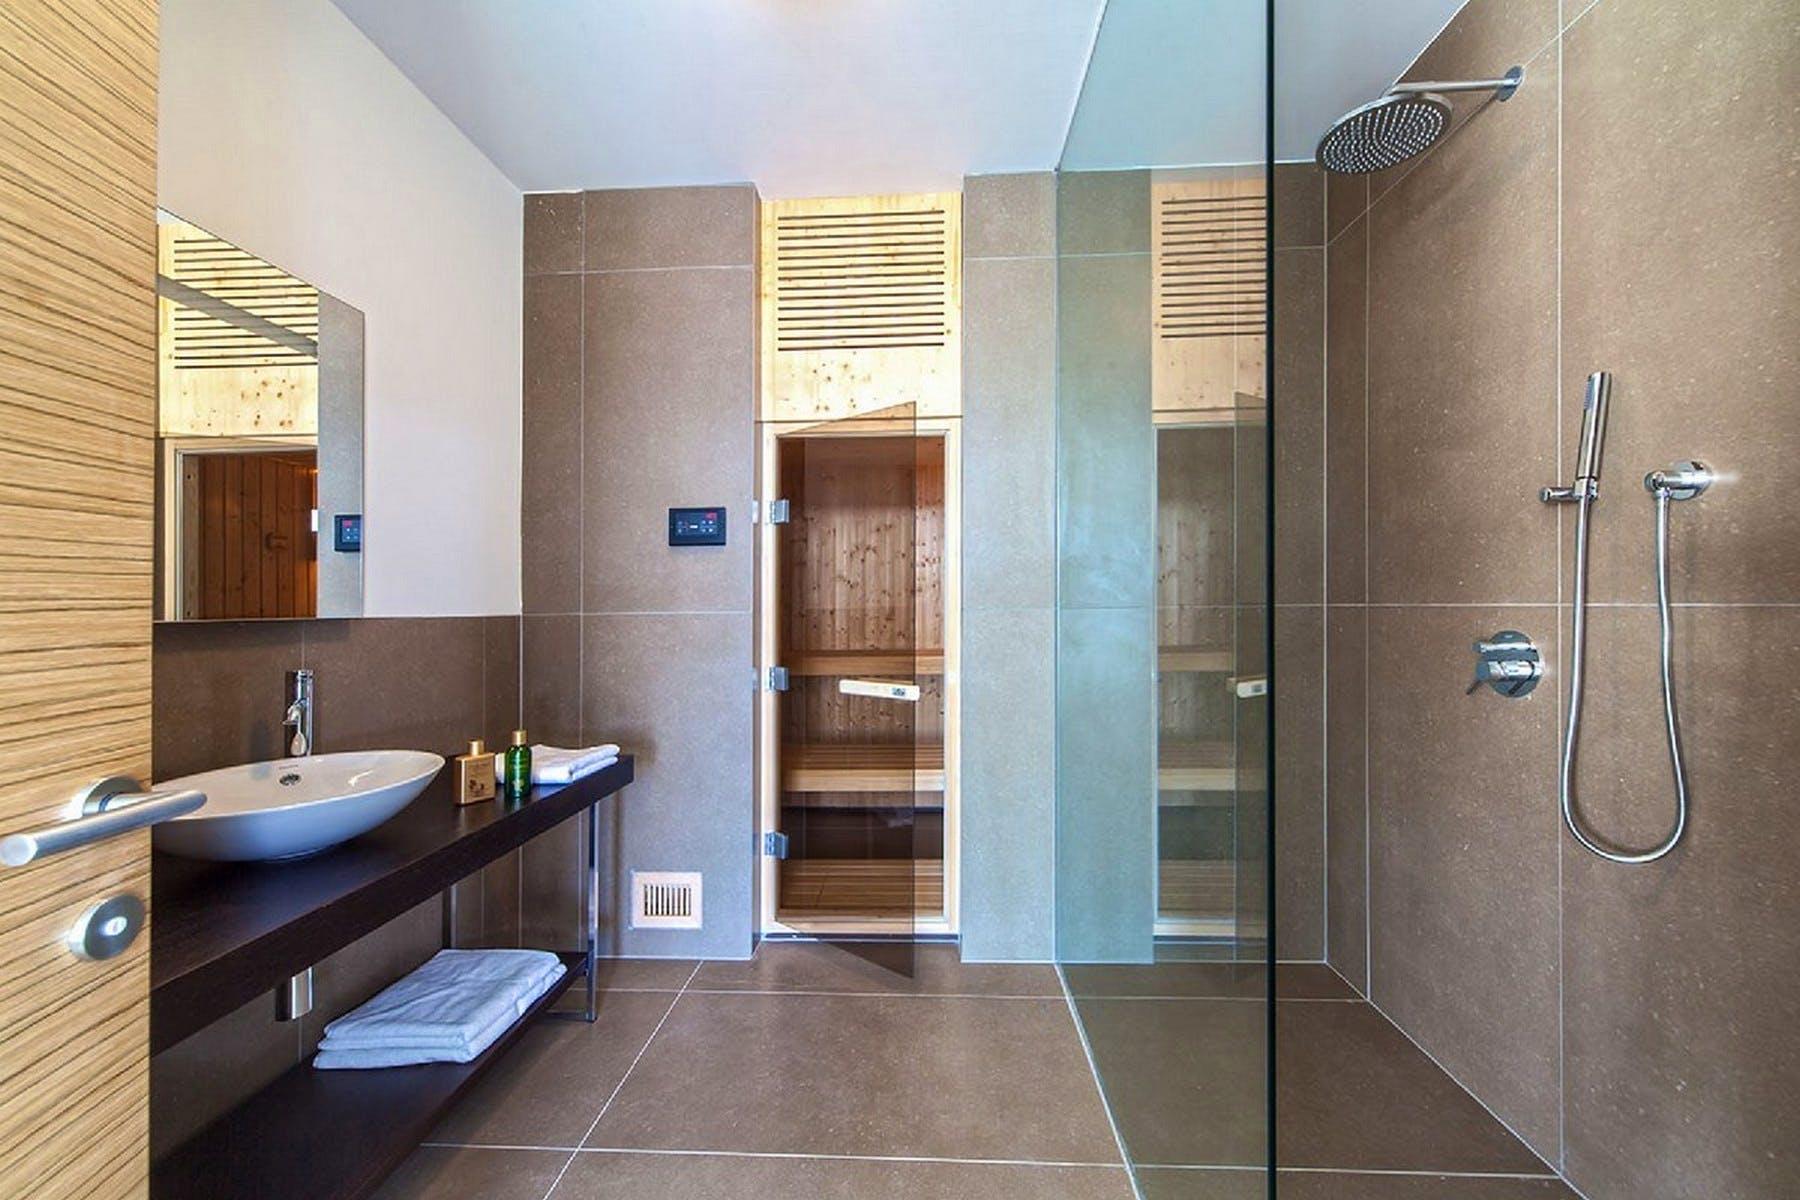 Modern bathroom with a sauna